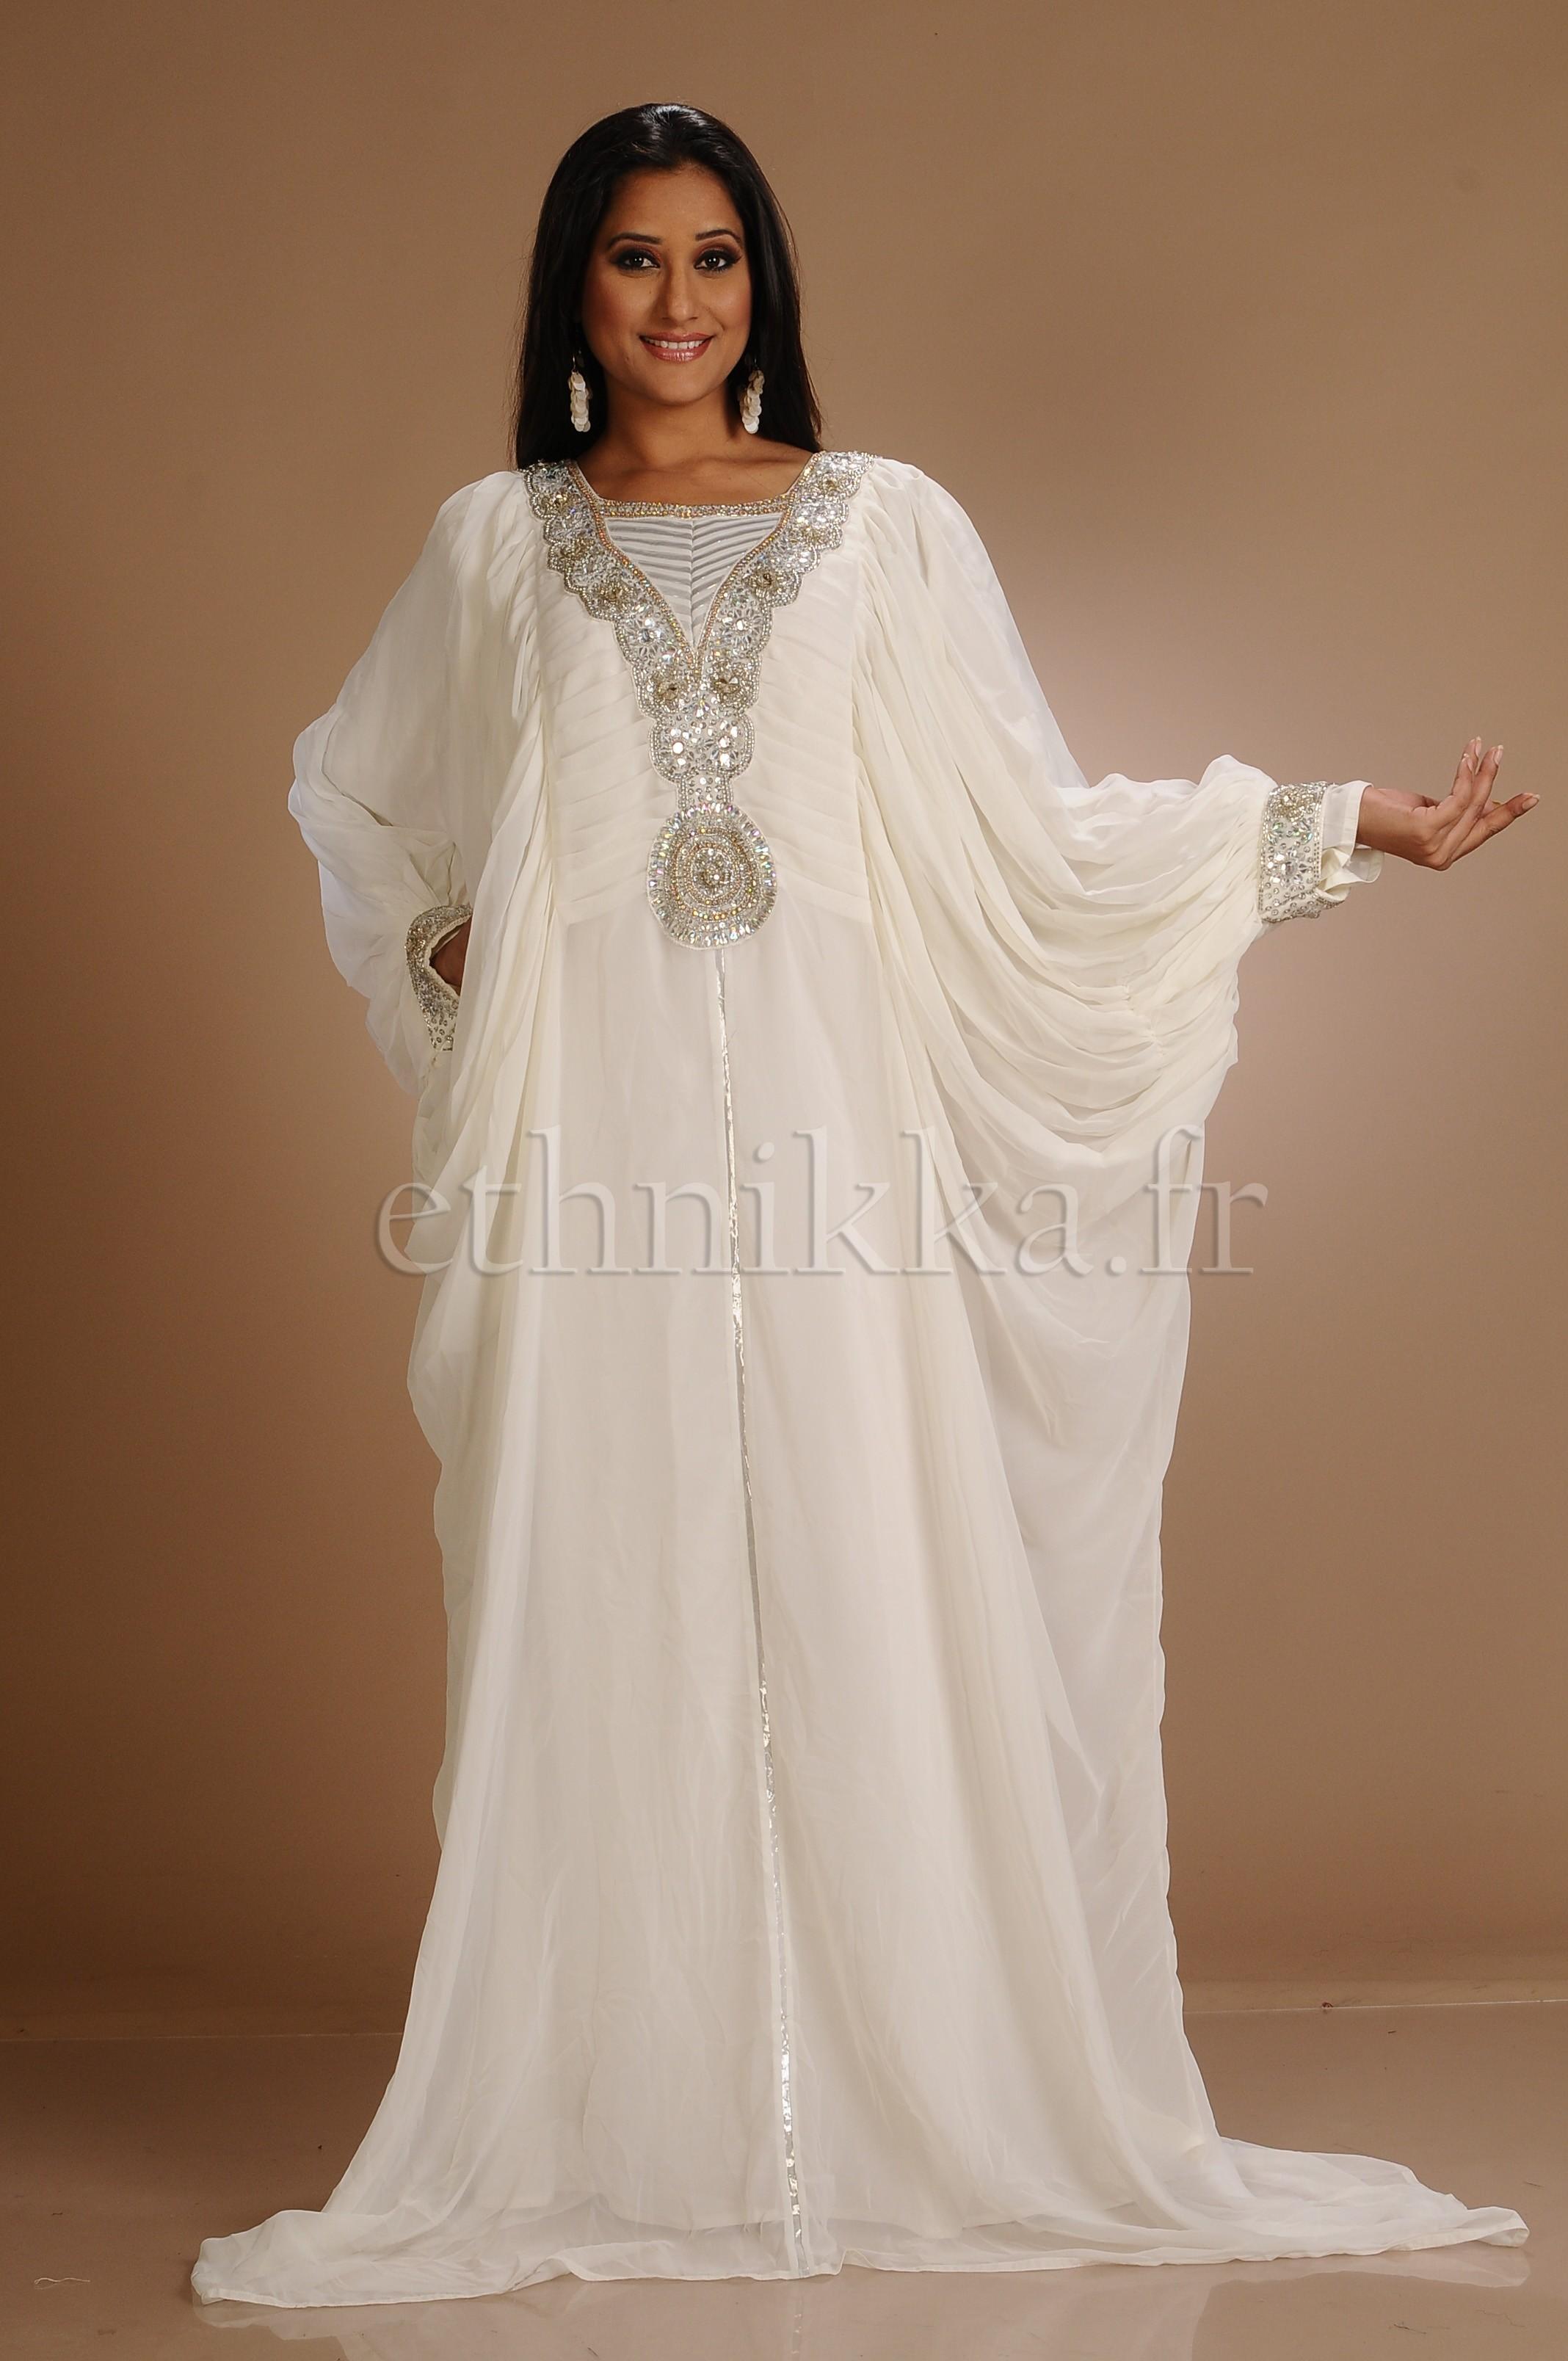 Robe dubai blanc pas cher